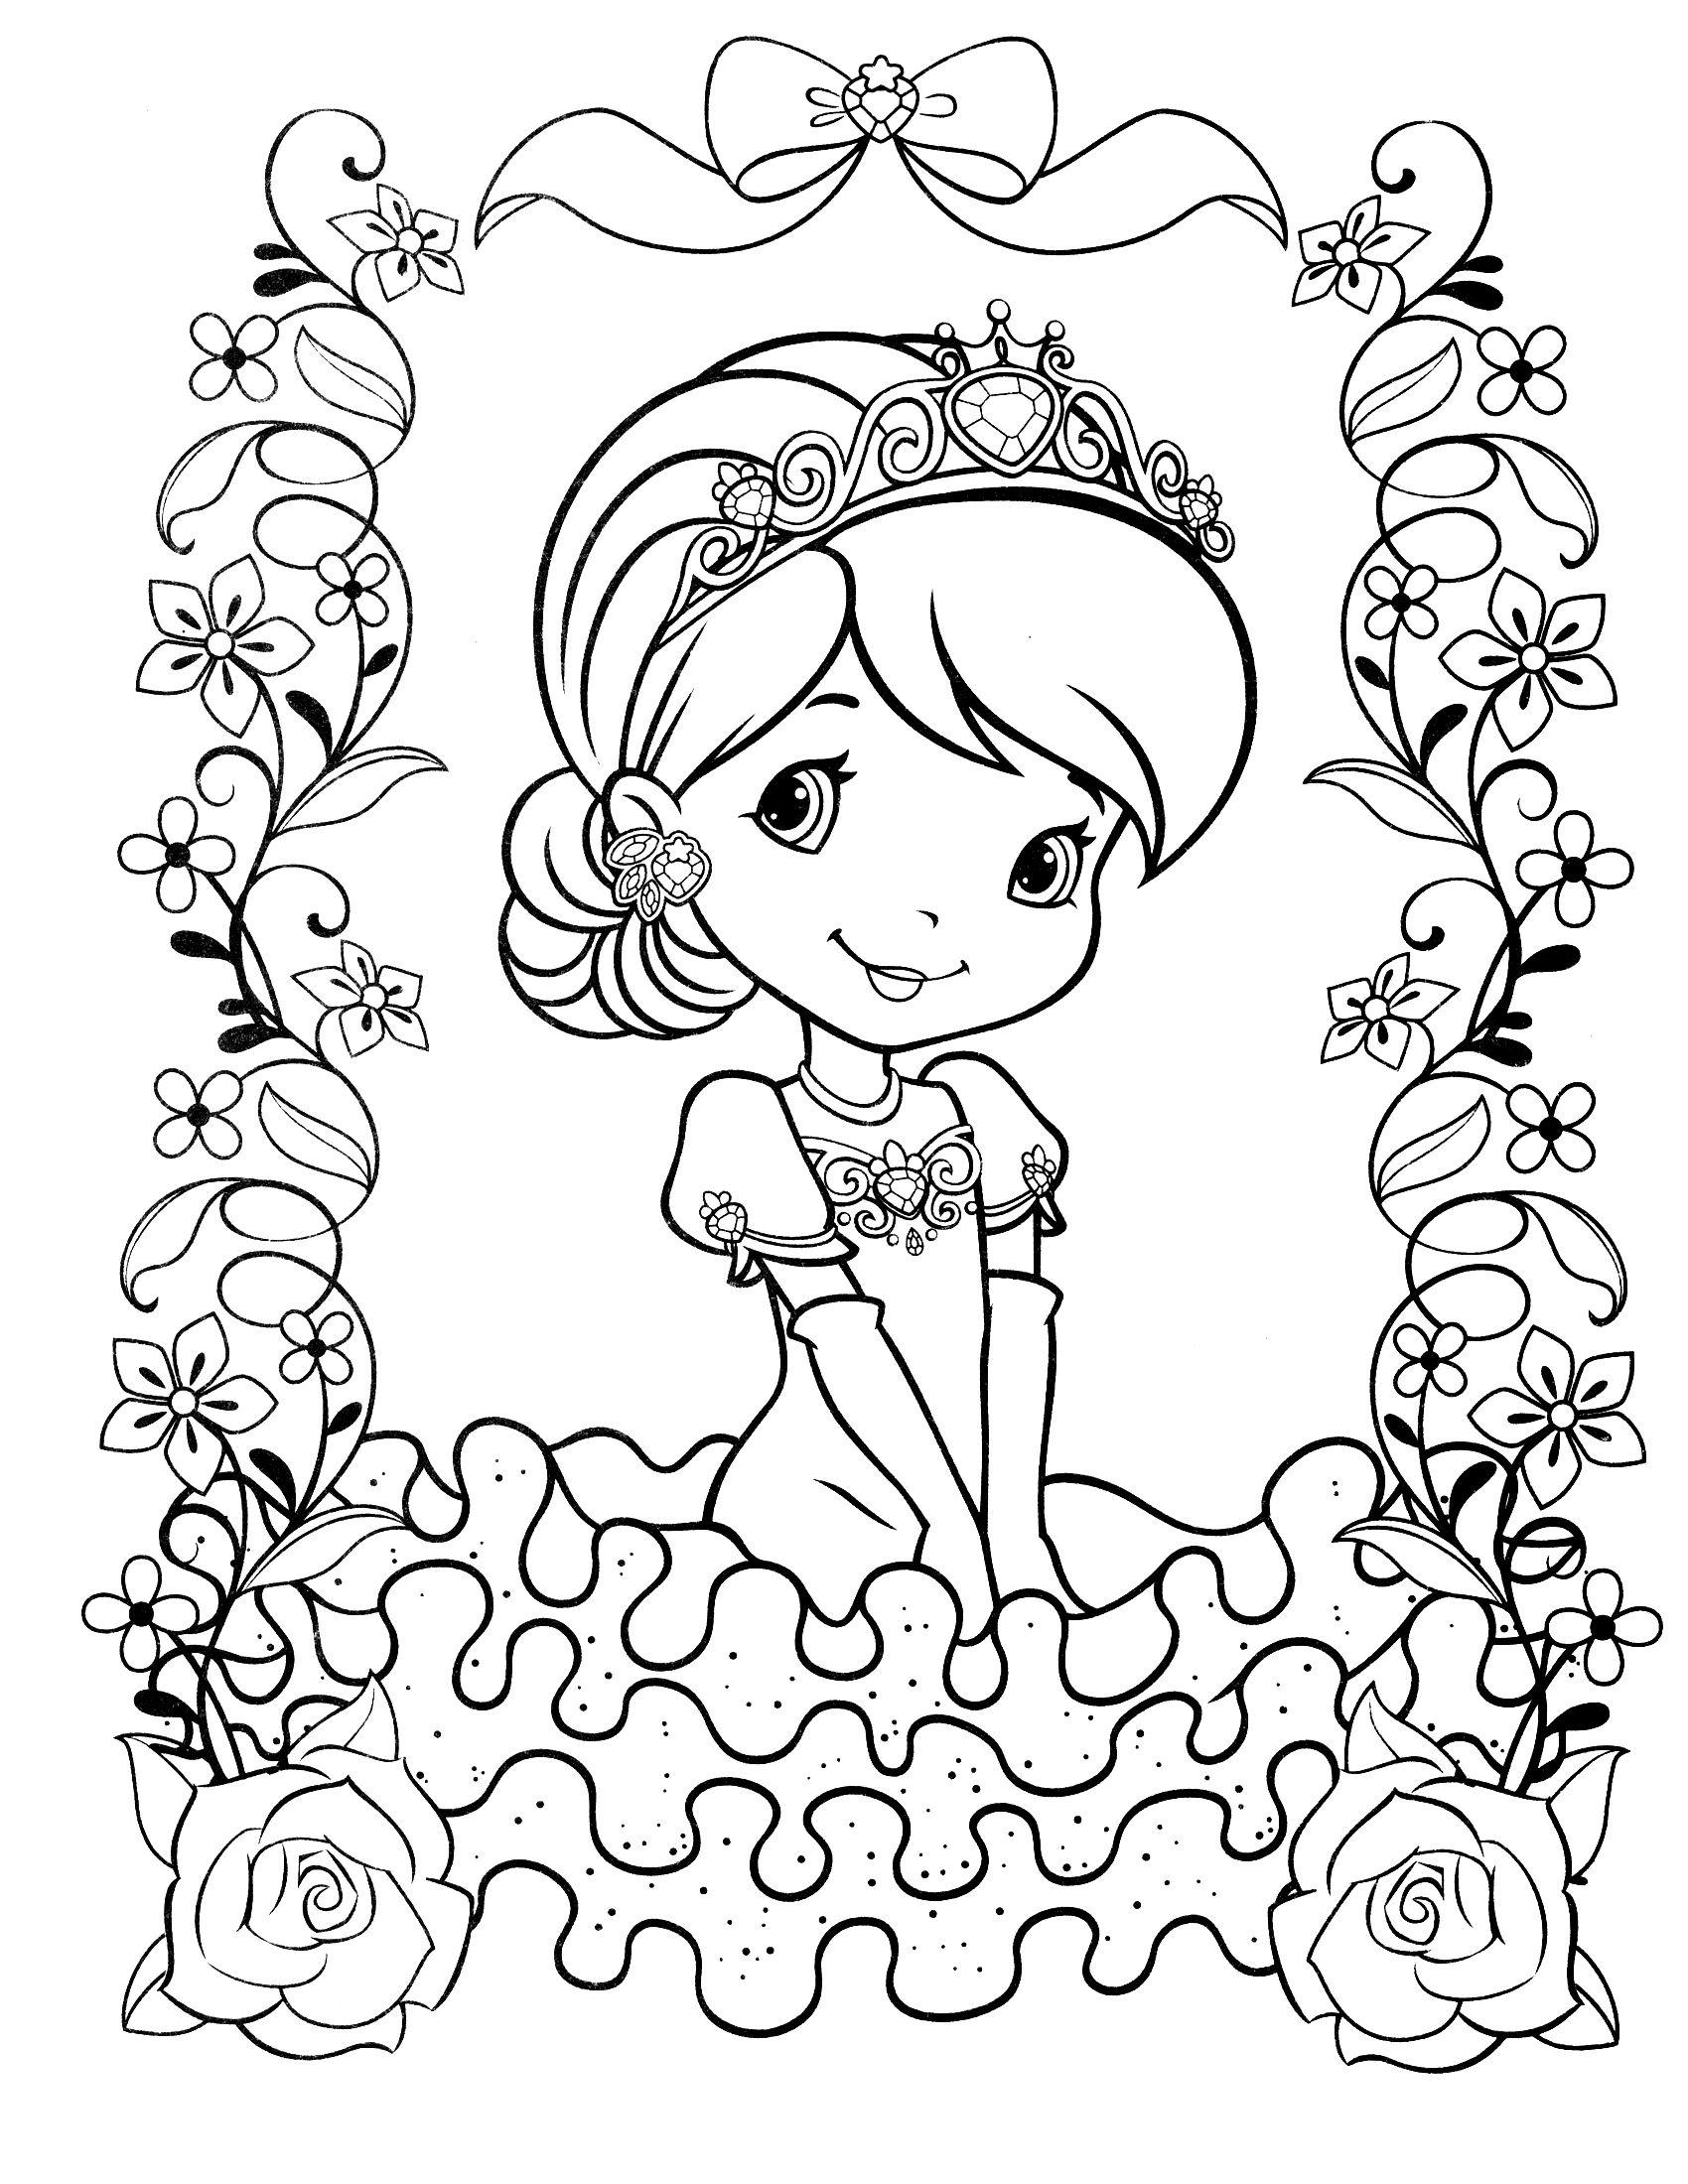 Strawberry Shortcake Coloring Page | Strawberry Shortcake